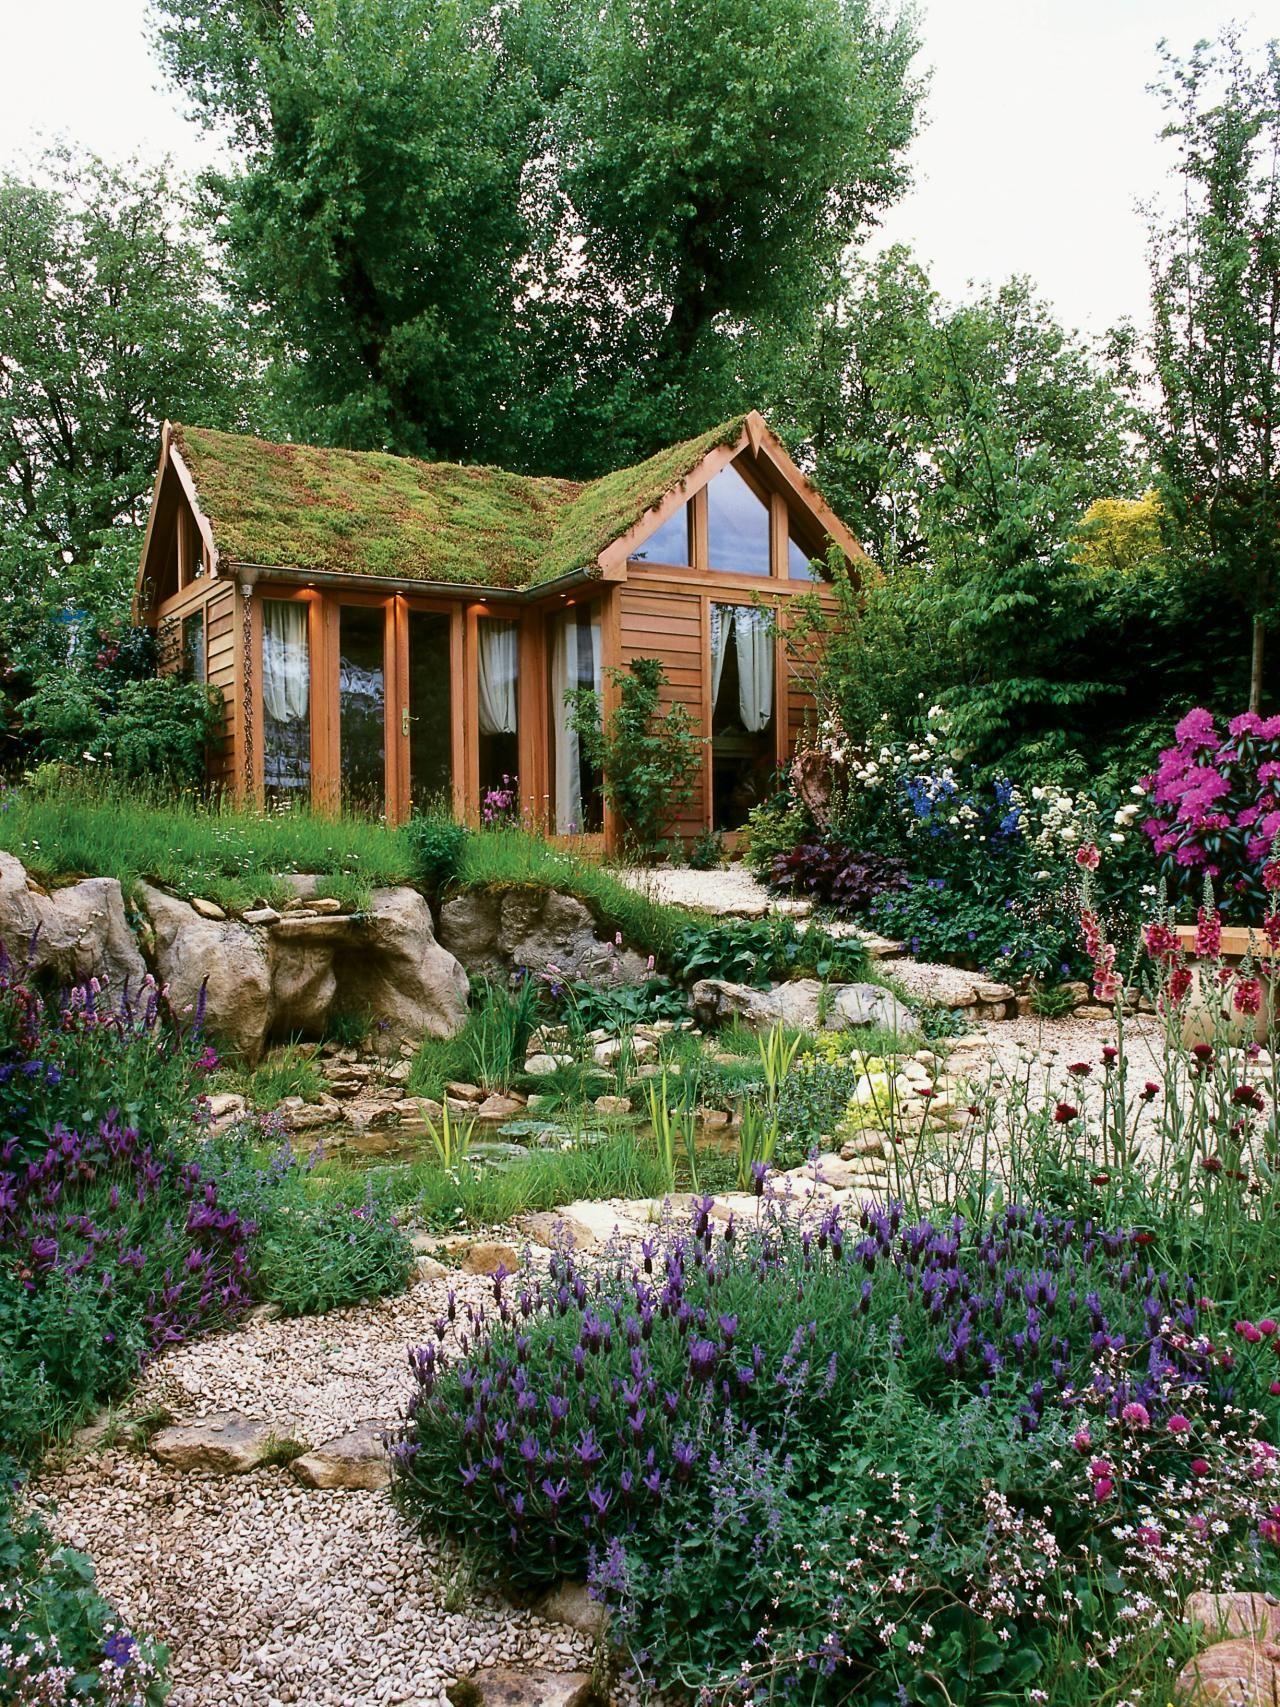 Drawing Inspiration From Vacation: A Coastal-Themed Garden   garden ...